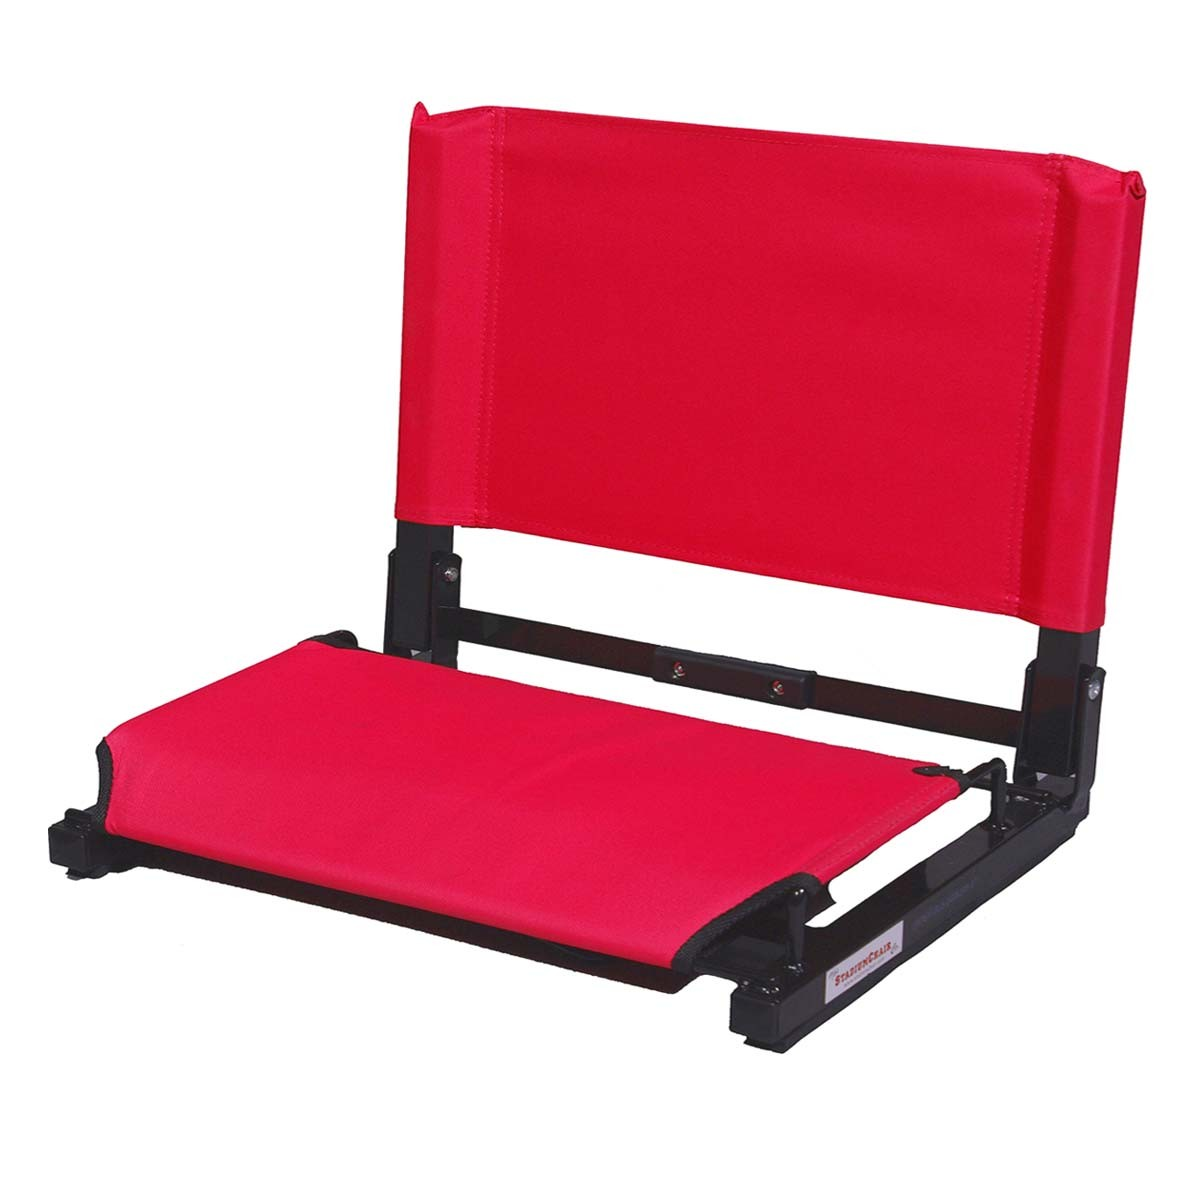 stadium seat with back - stadium seat chair | anthem sports